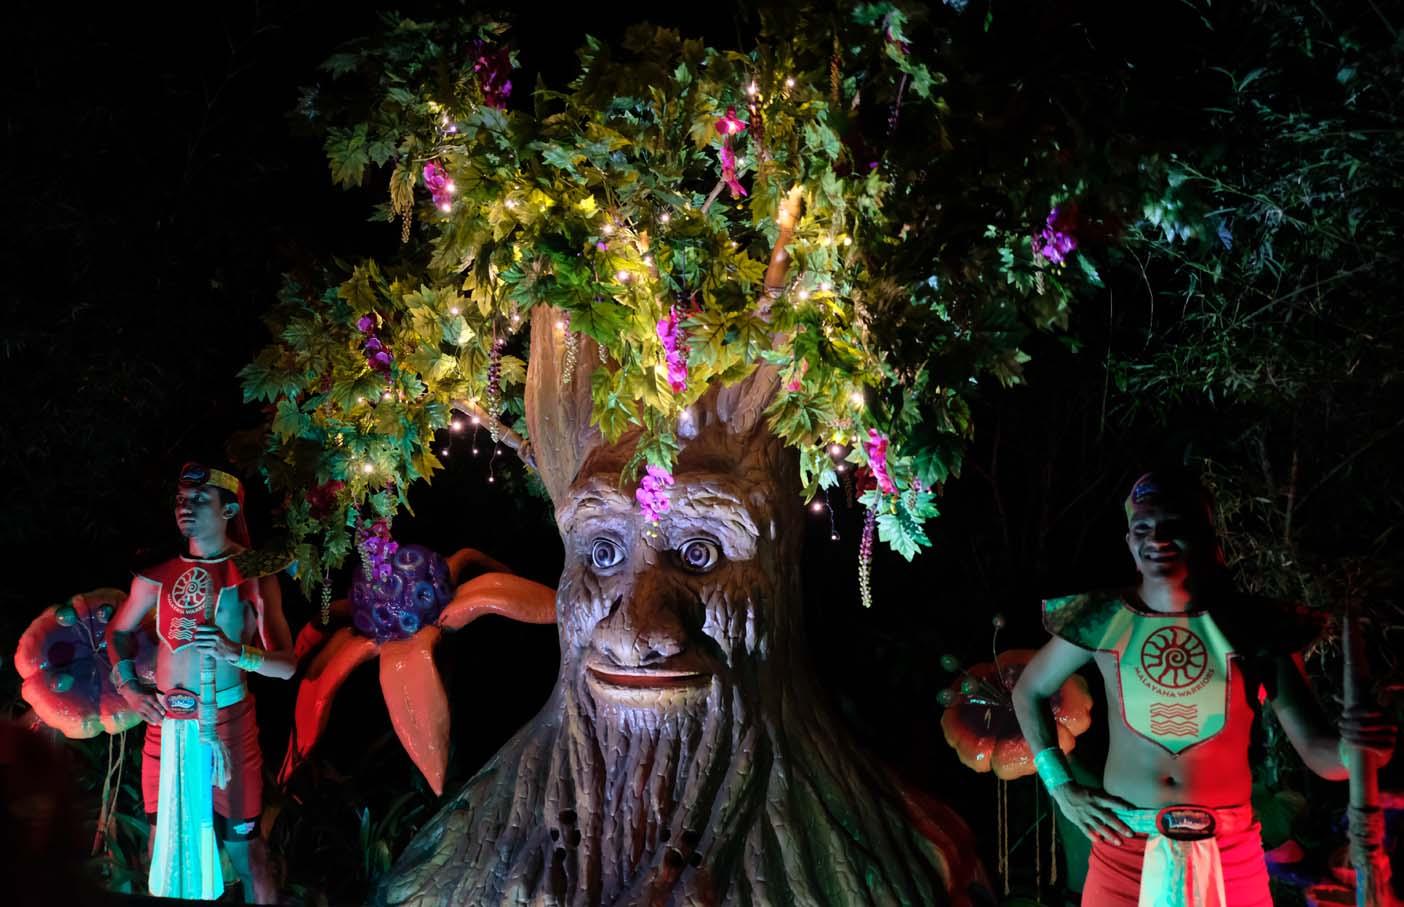 lost world of tambun luminious forest